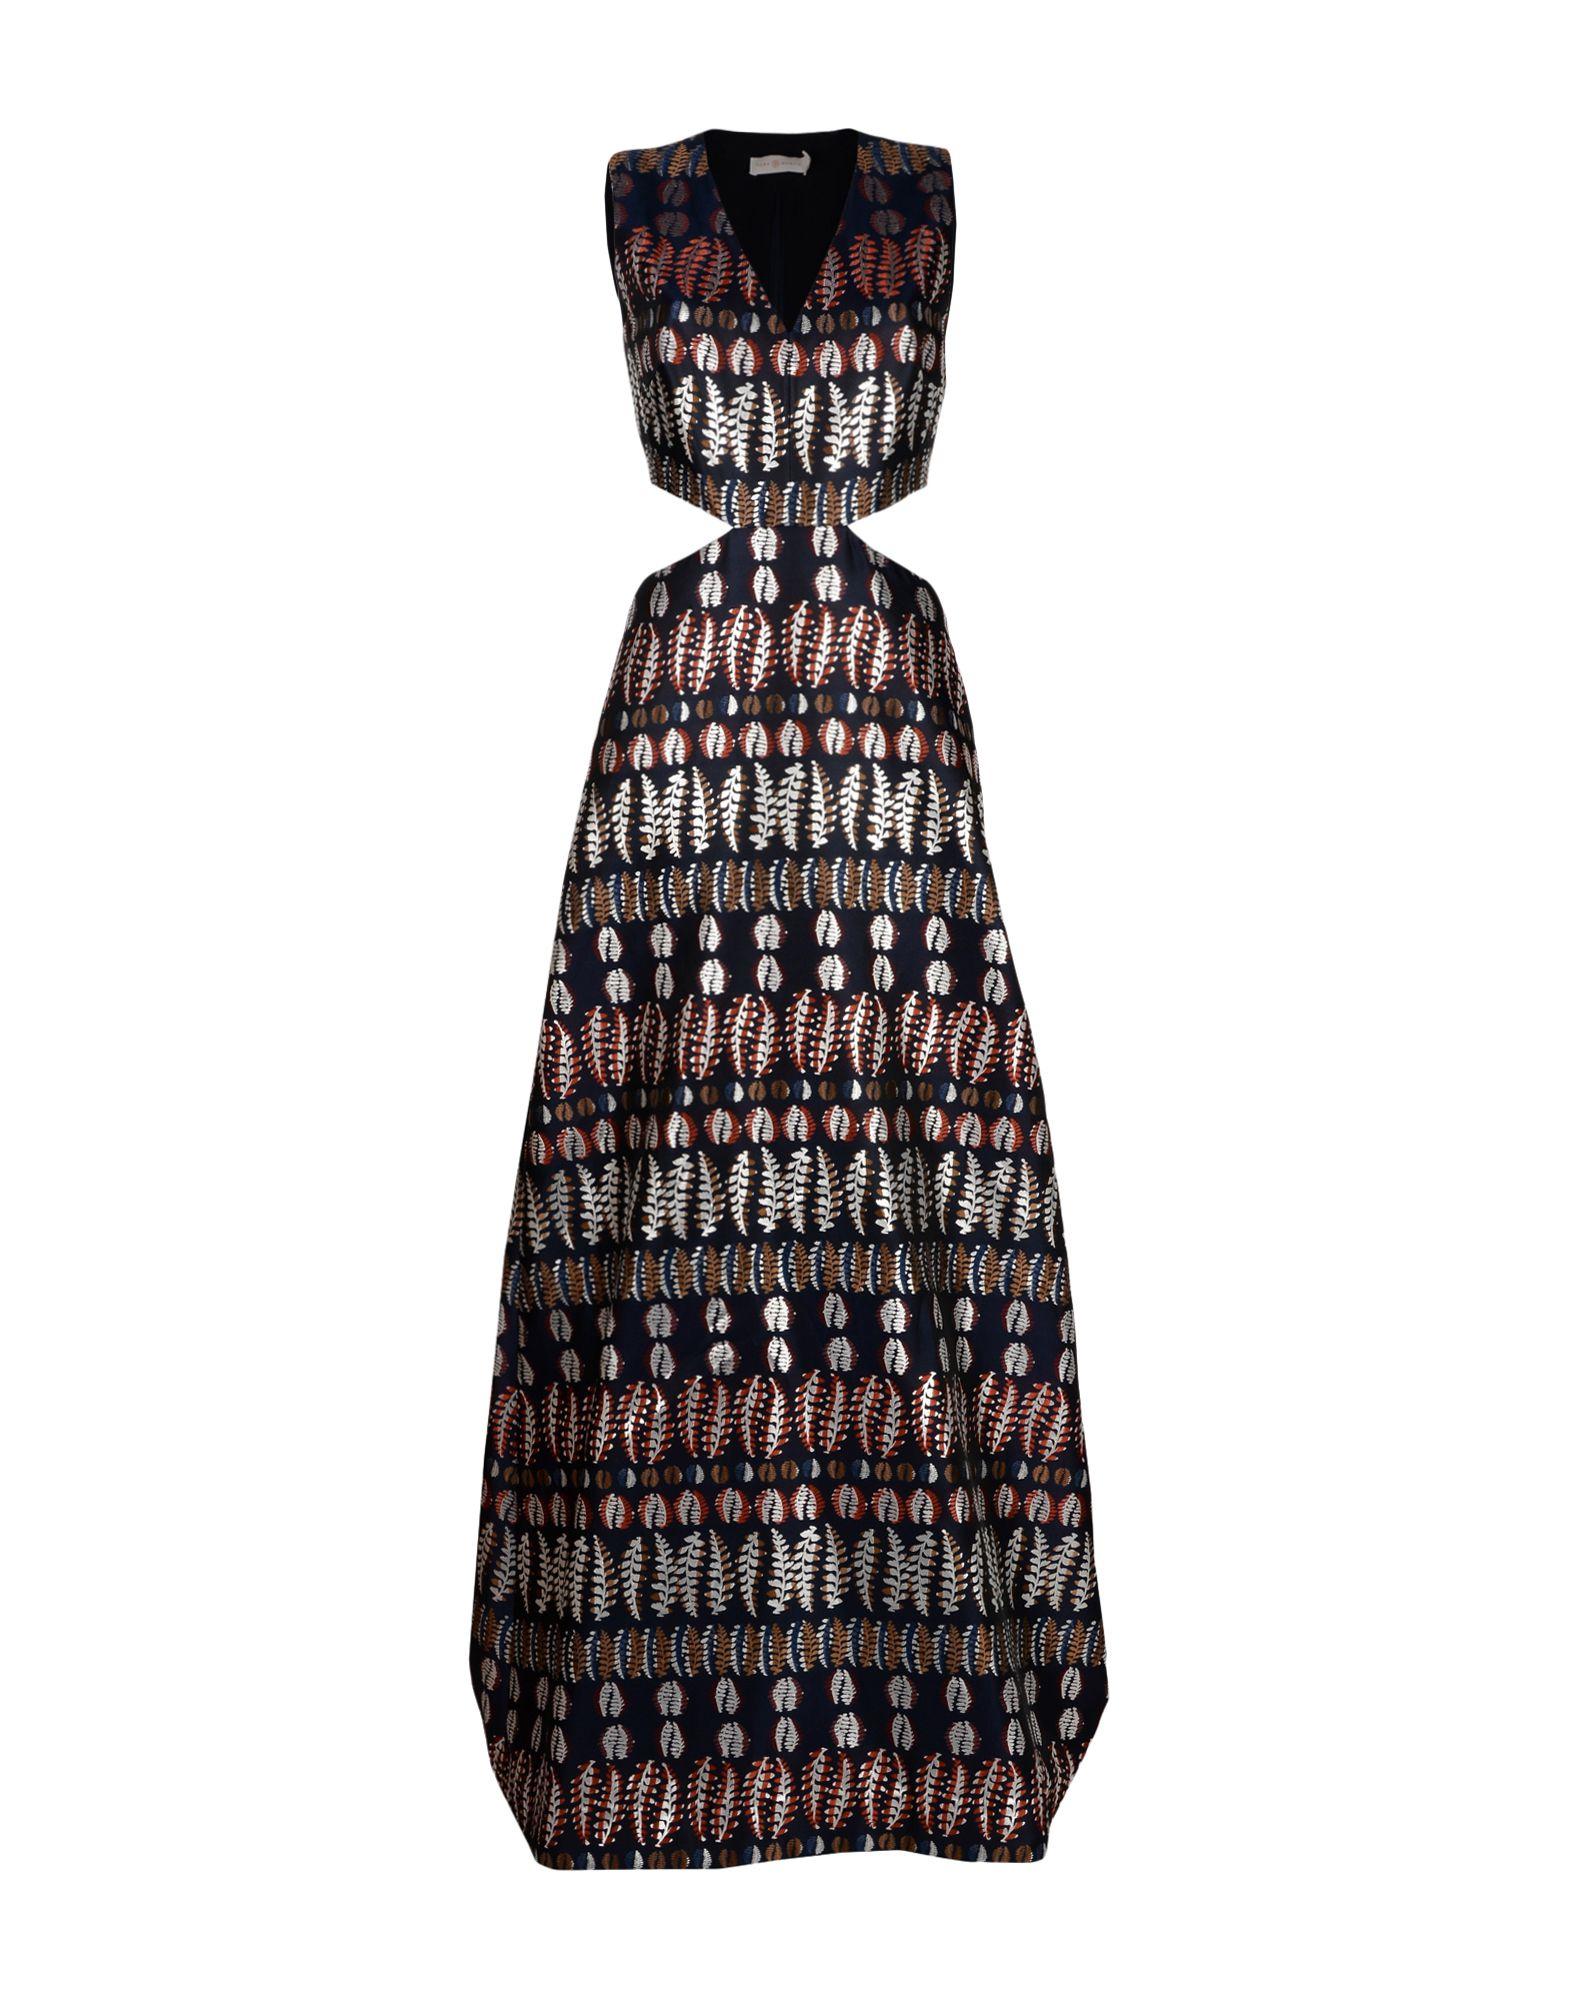 TORY BURCH ΦΟΡΕΜΑΤΑ Μακρύ φόρεμα